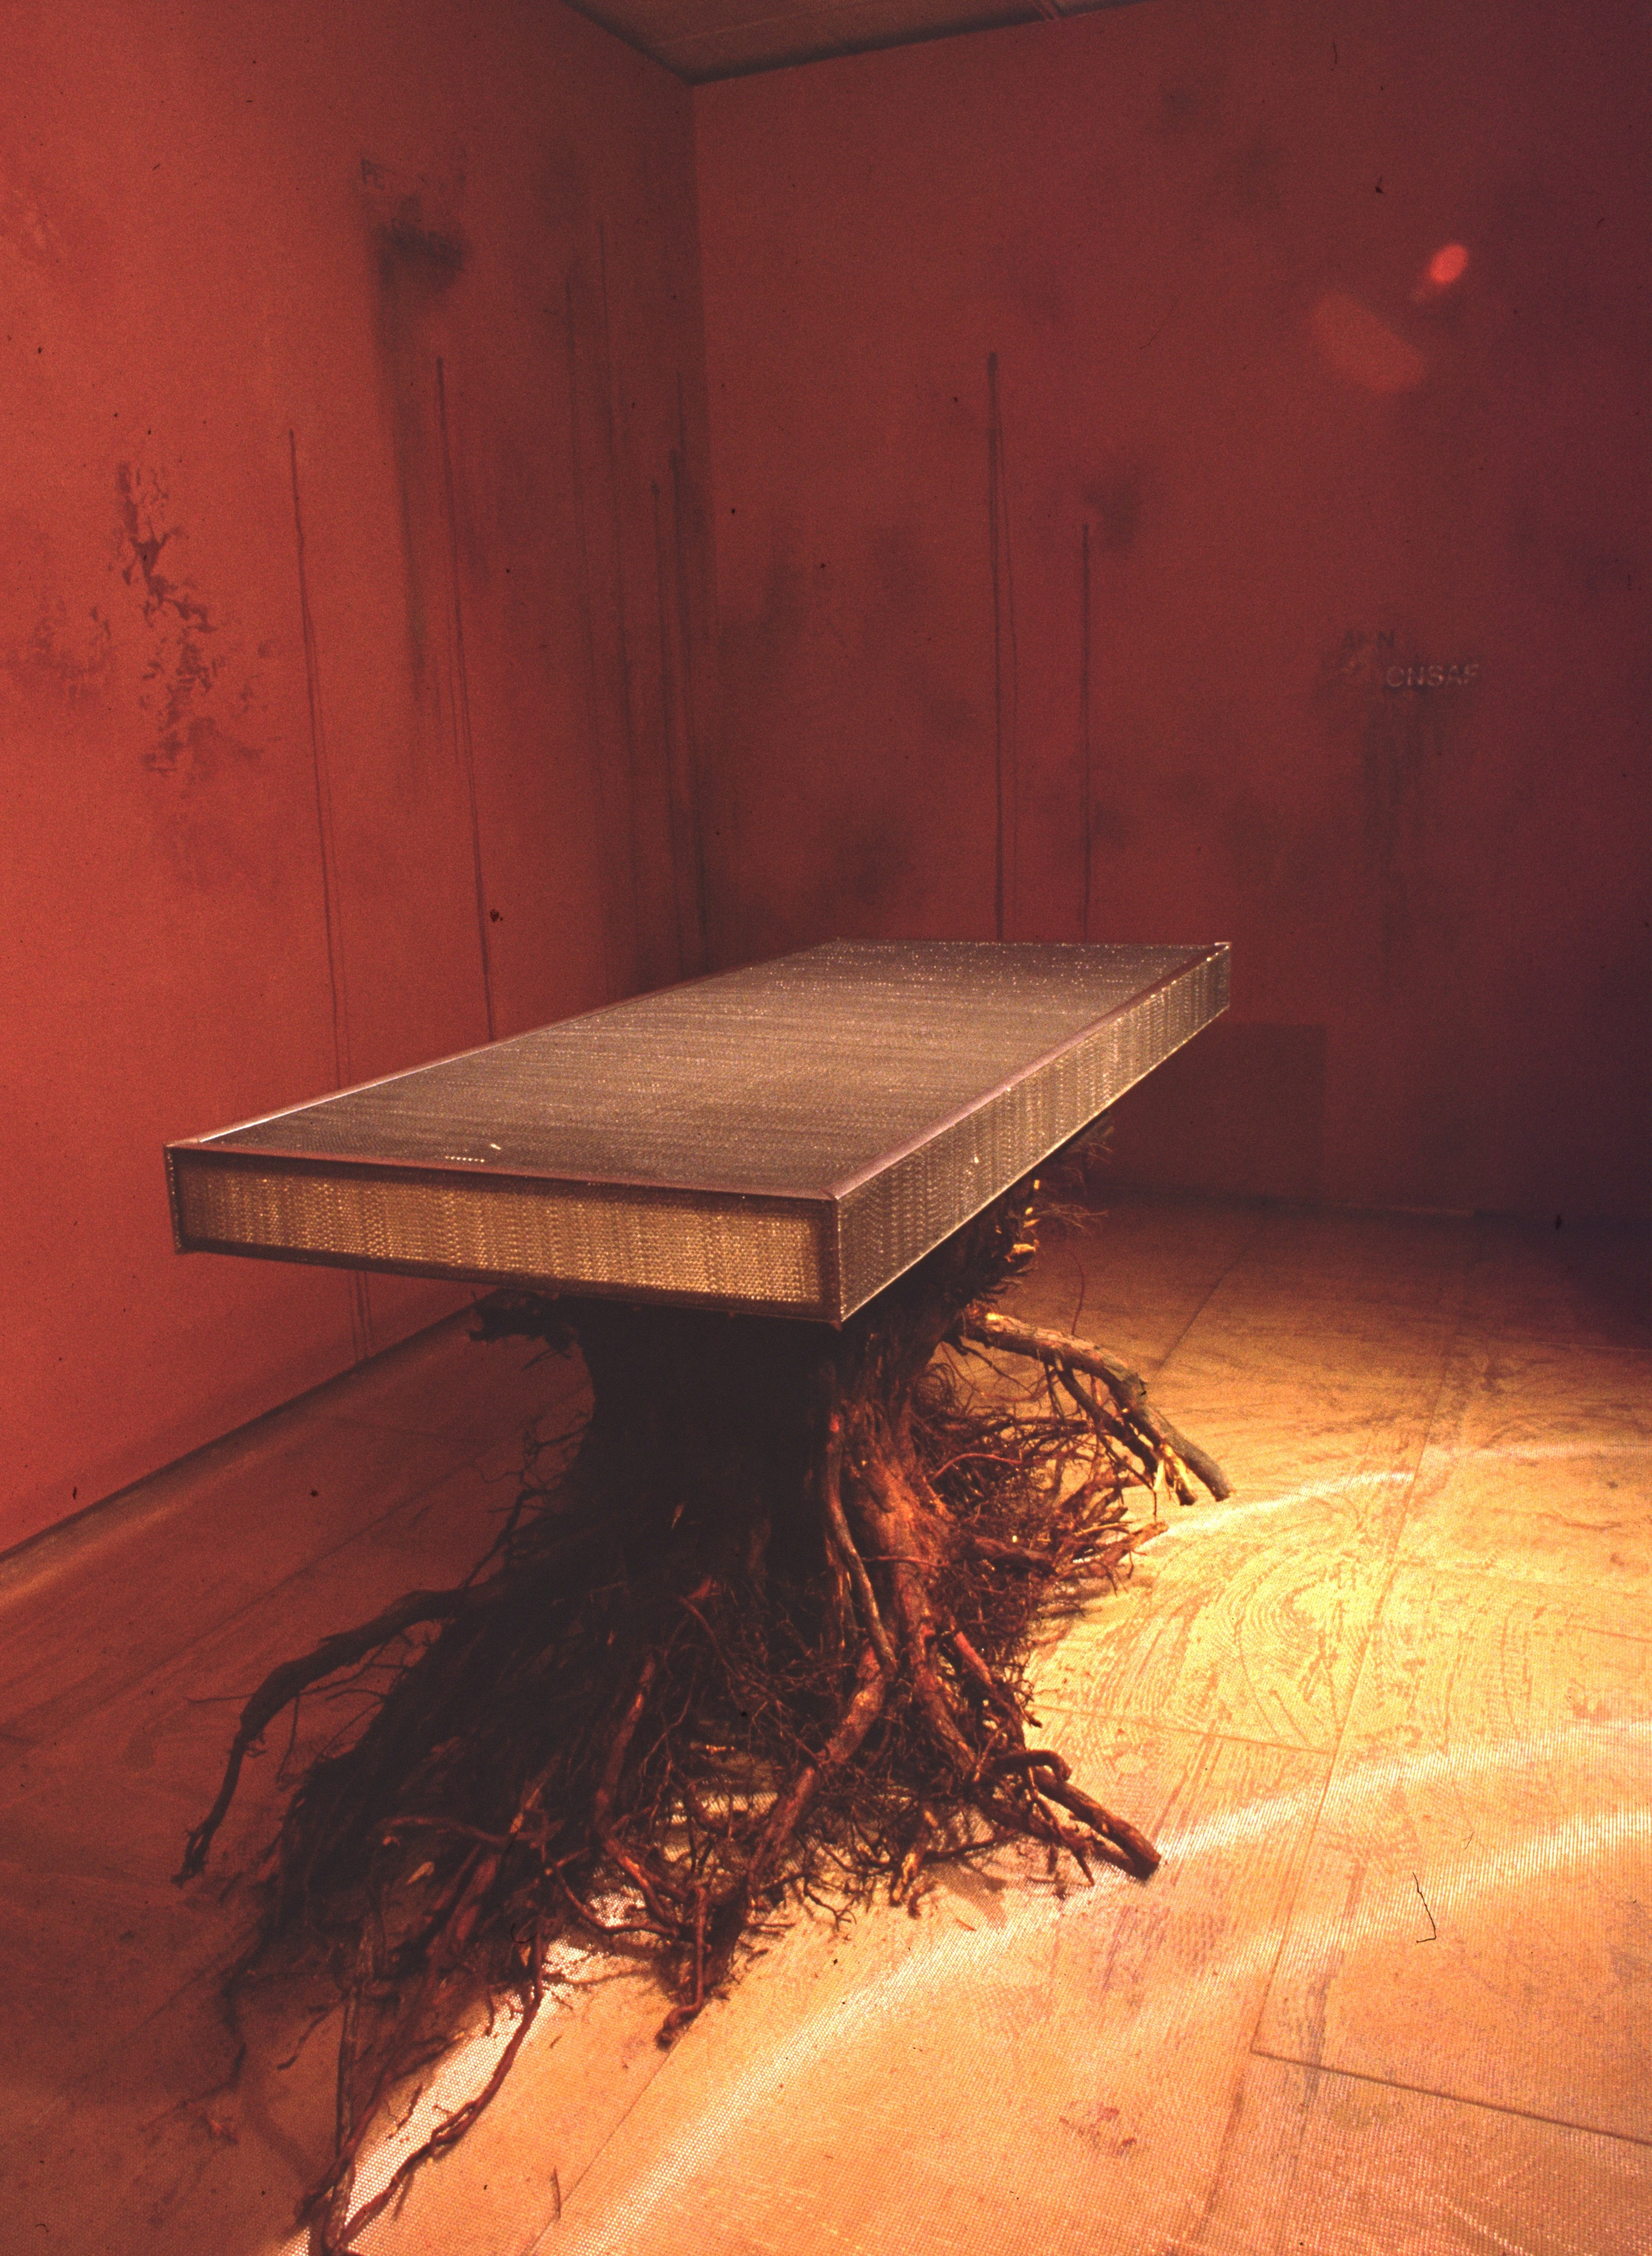 find the Syrian boys  installation detail  honeycomb aluminum, tree trunk  Bellevue Art Museum, Bellevue, WA  1992